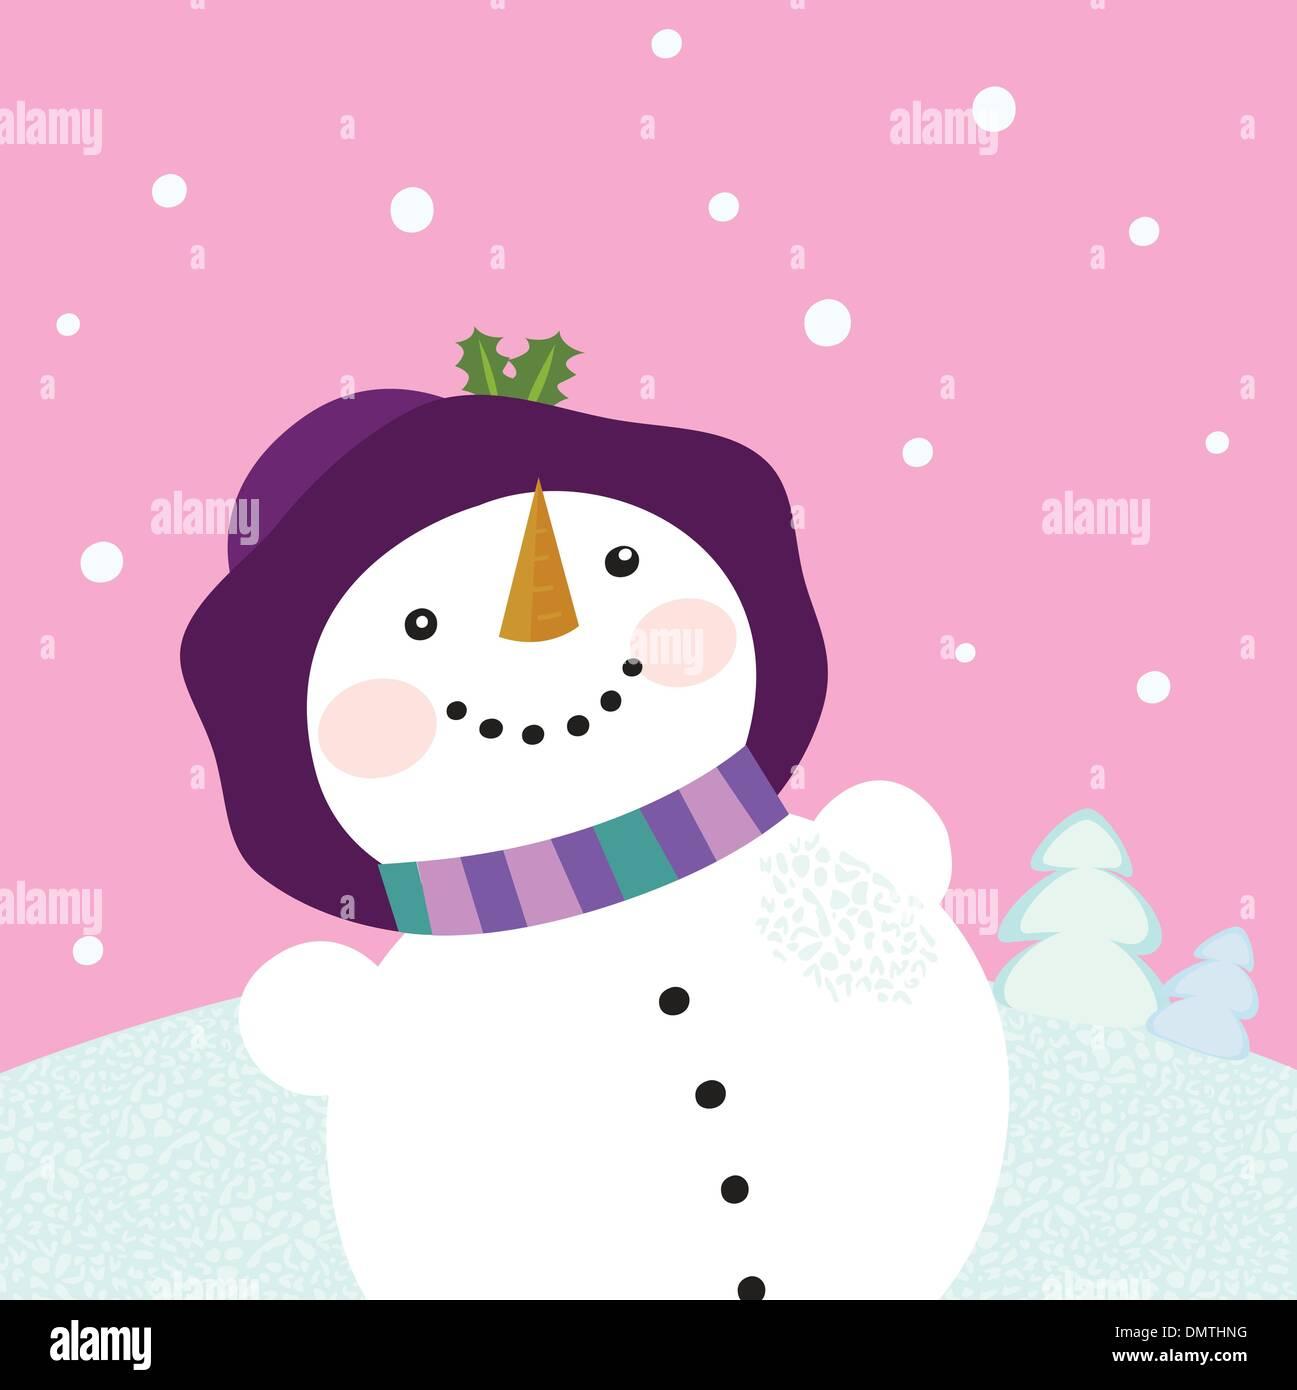 It's snowing - Winter snowman lady - Stock Image